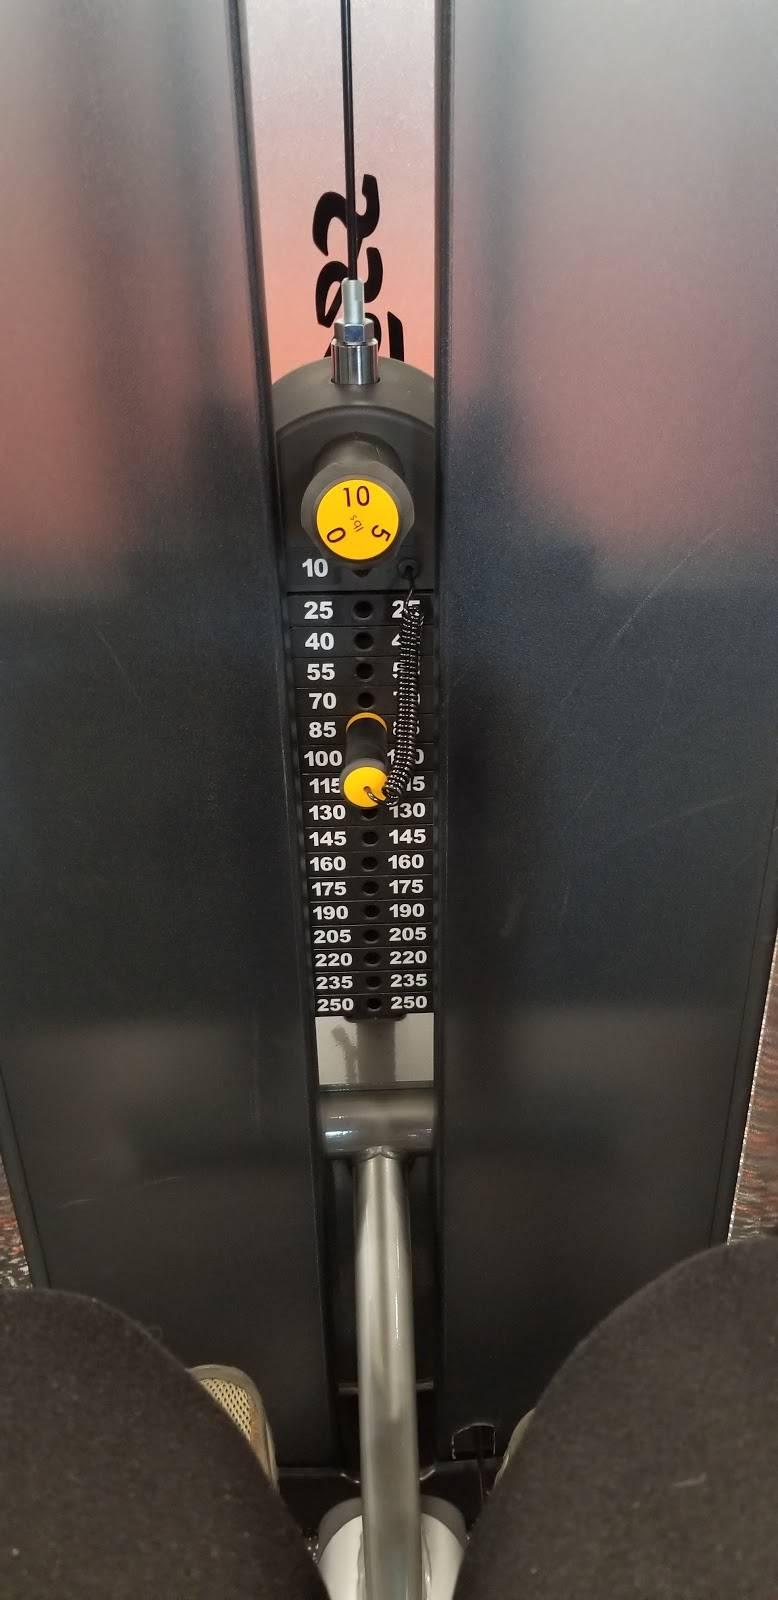 Xperience Fitness of Blaine South - gym  | Photo 6 of 8 | Address: 8943 University Ave NE Suite 200, Blaine, MN 55434, USA | Phone: (763) 296-0800